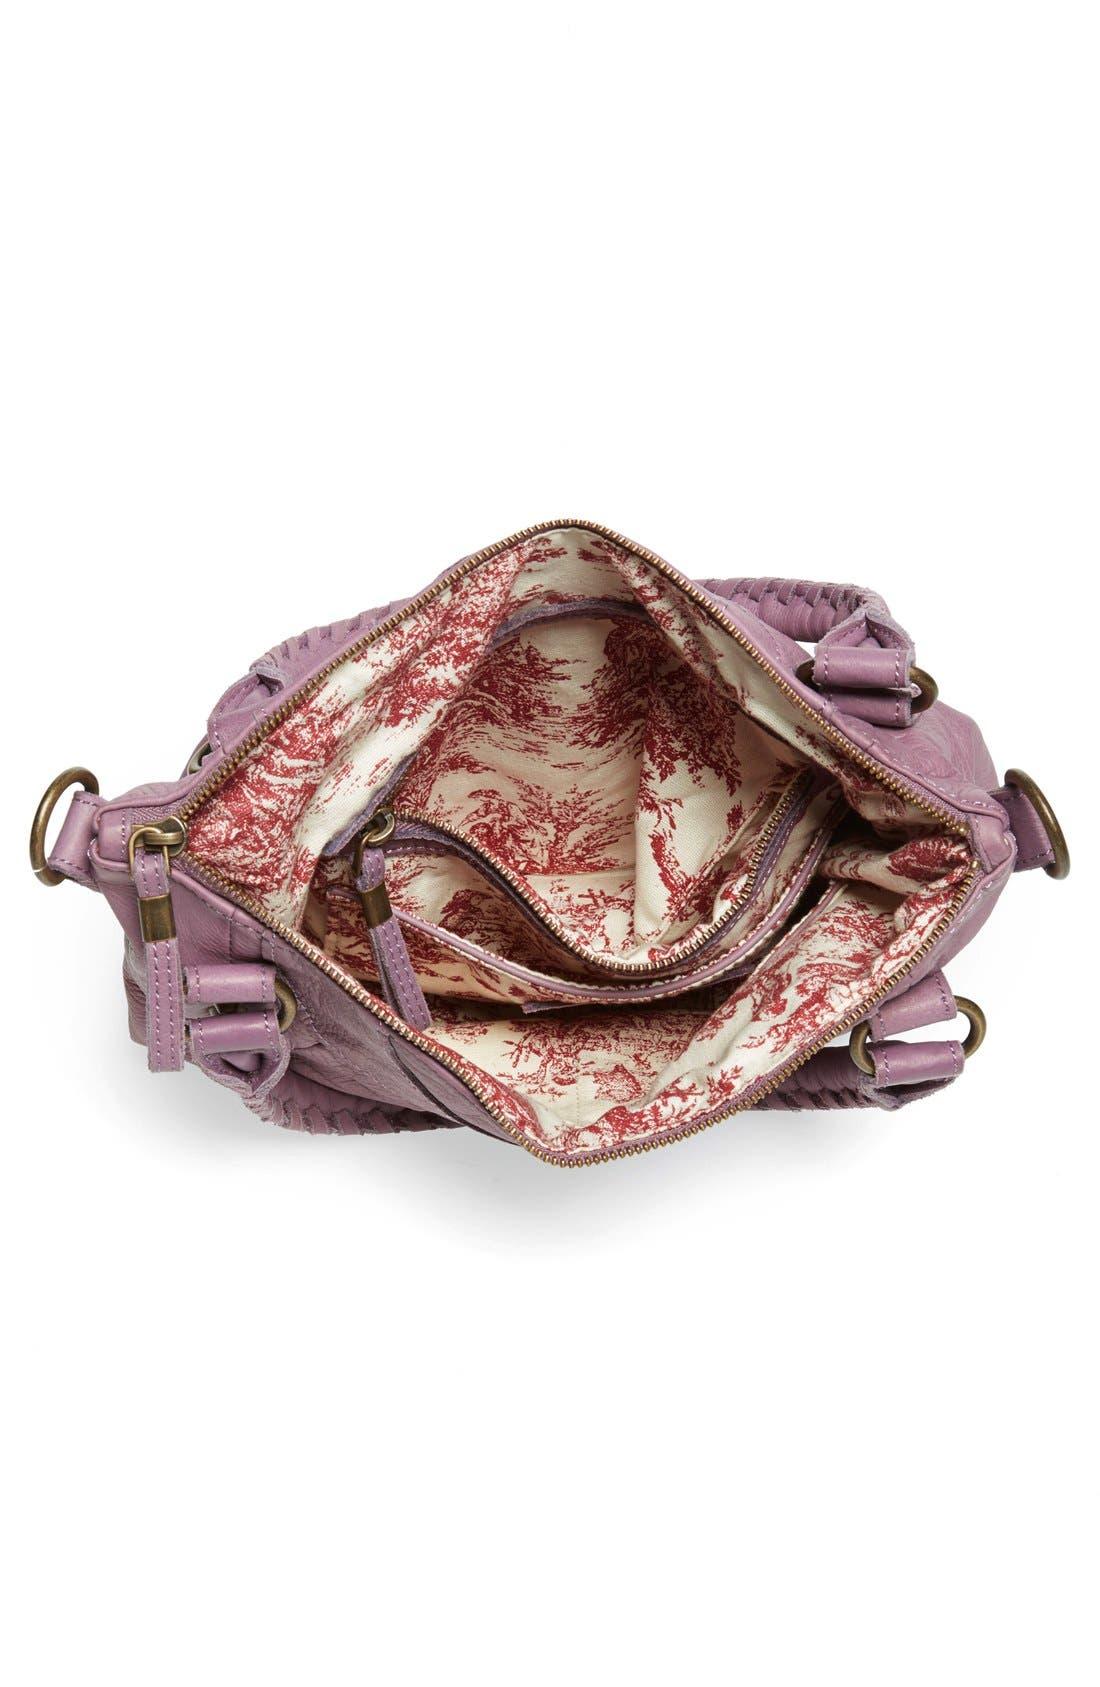 'Vintage Gina' Soft Leather Handbag,                             Alternate thumbnail 3, color,                             500